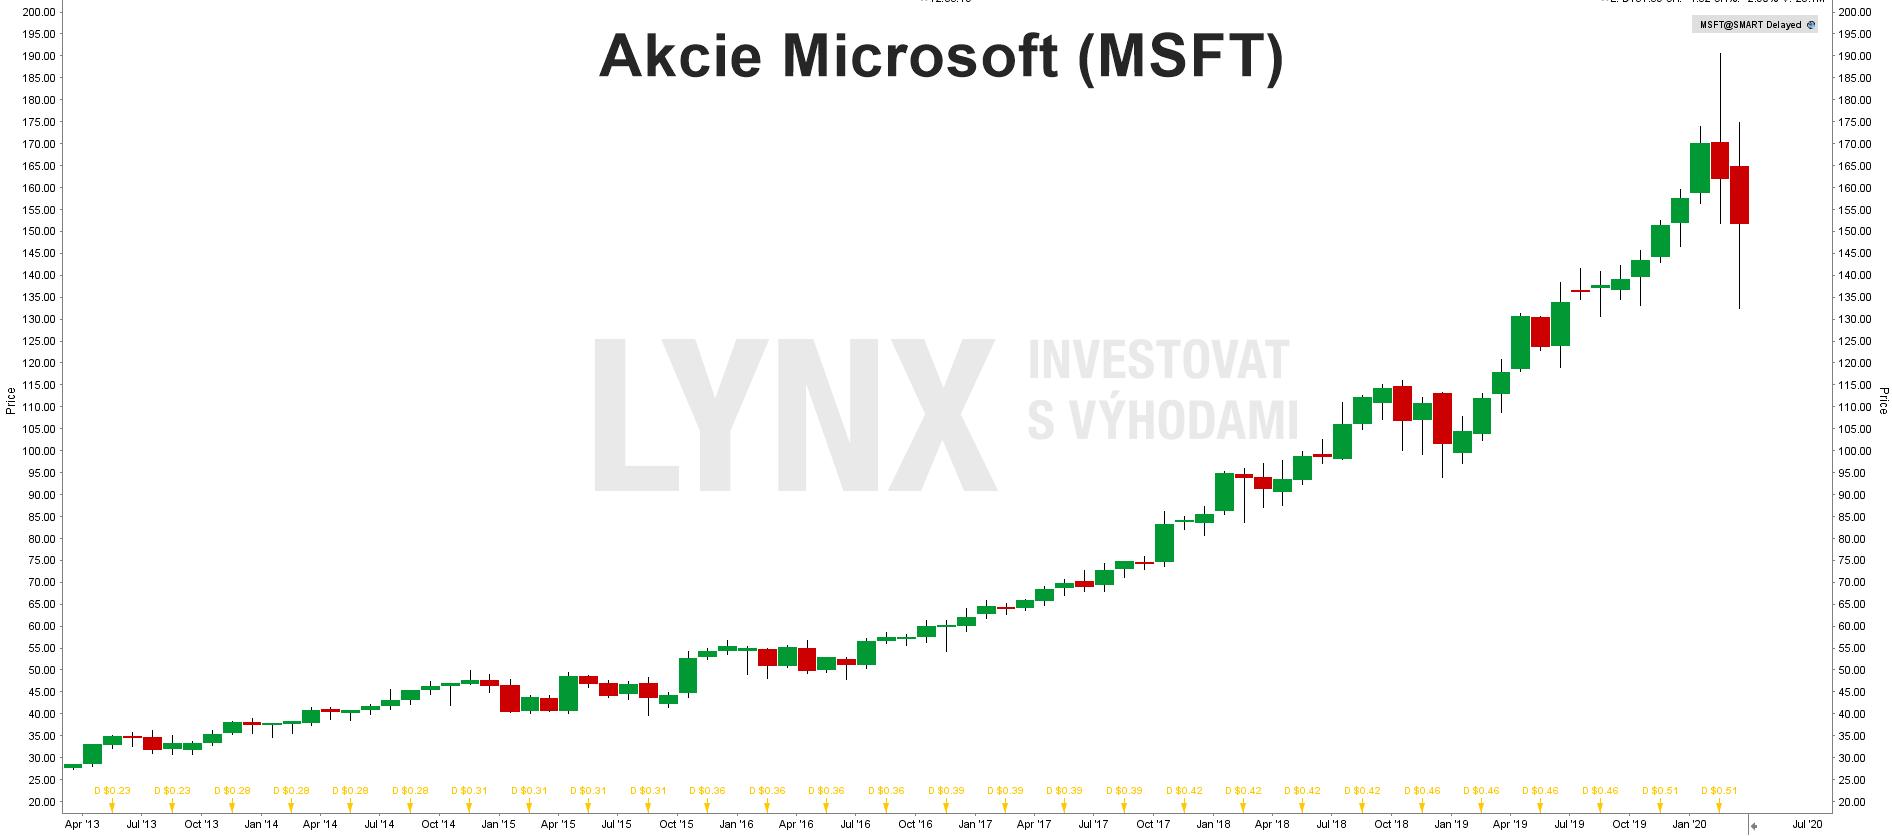 Akcie Microsoft (MSFT)